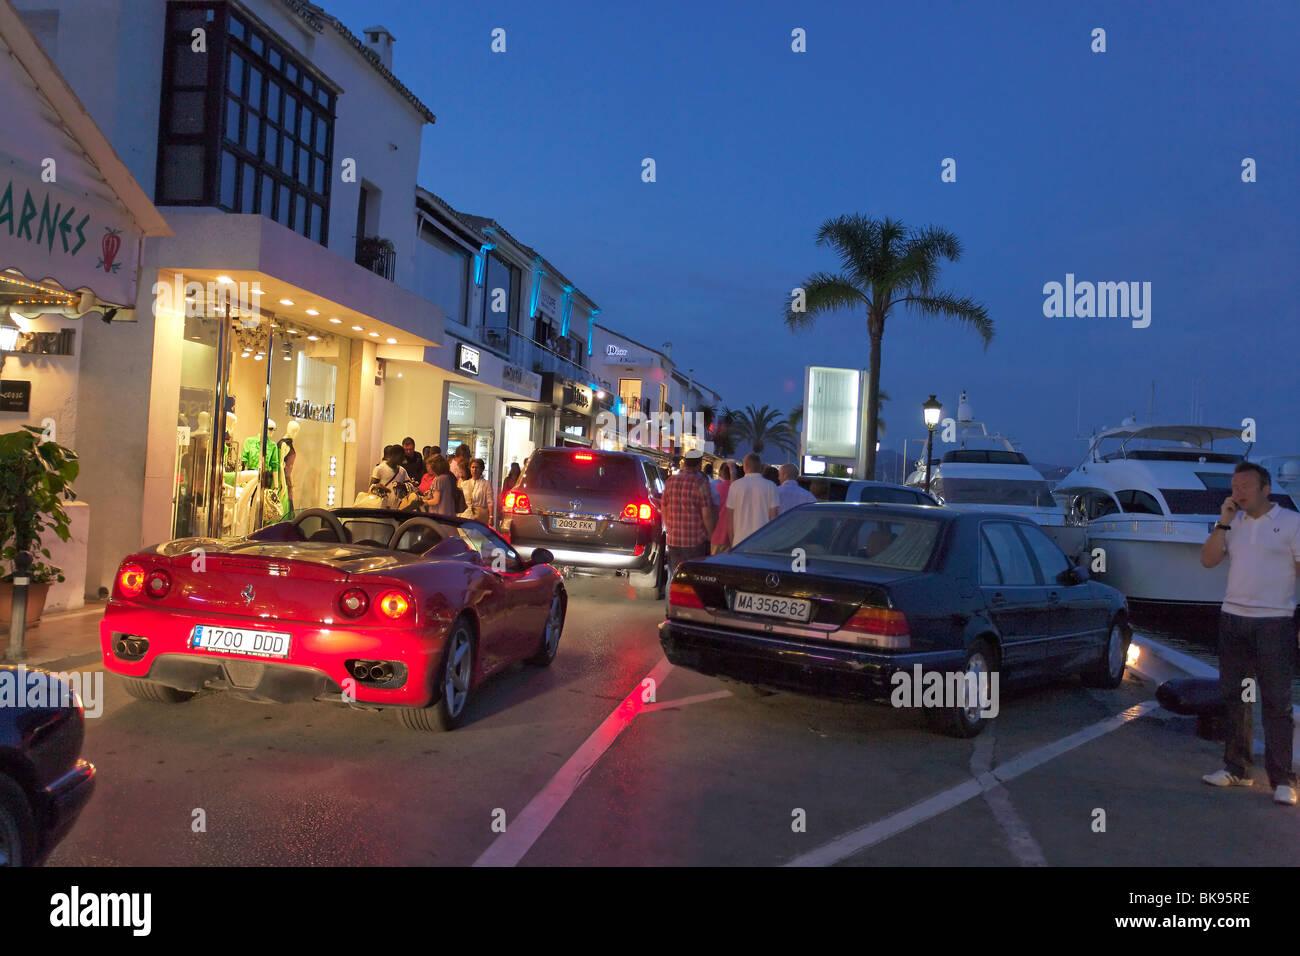 luxury cars restaurants near harbour puerto banus marbella andalusia spain